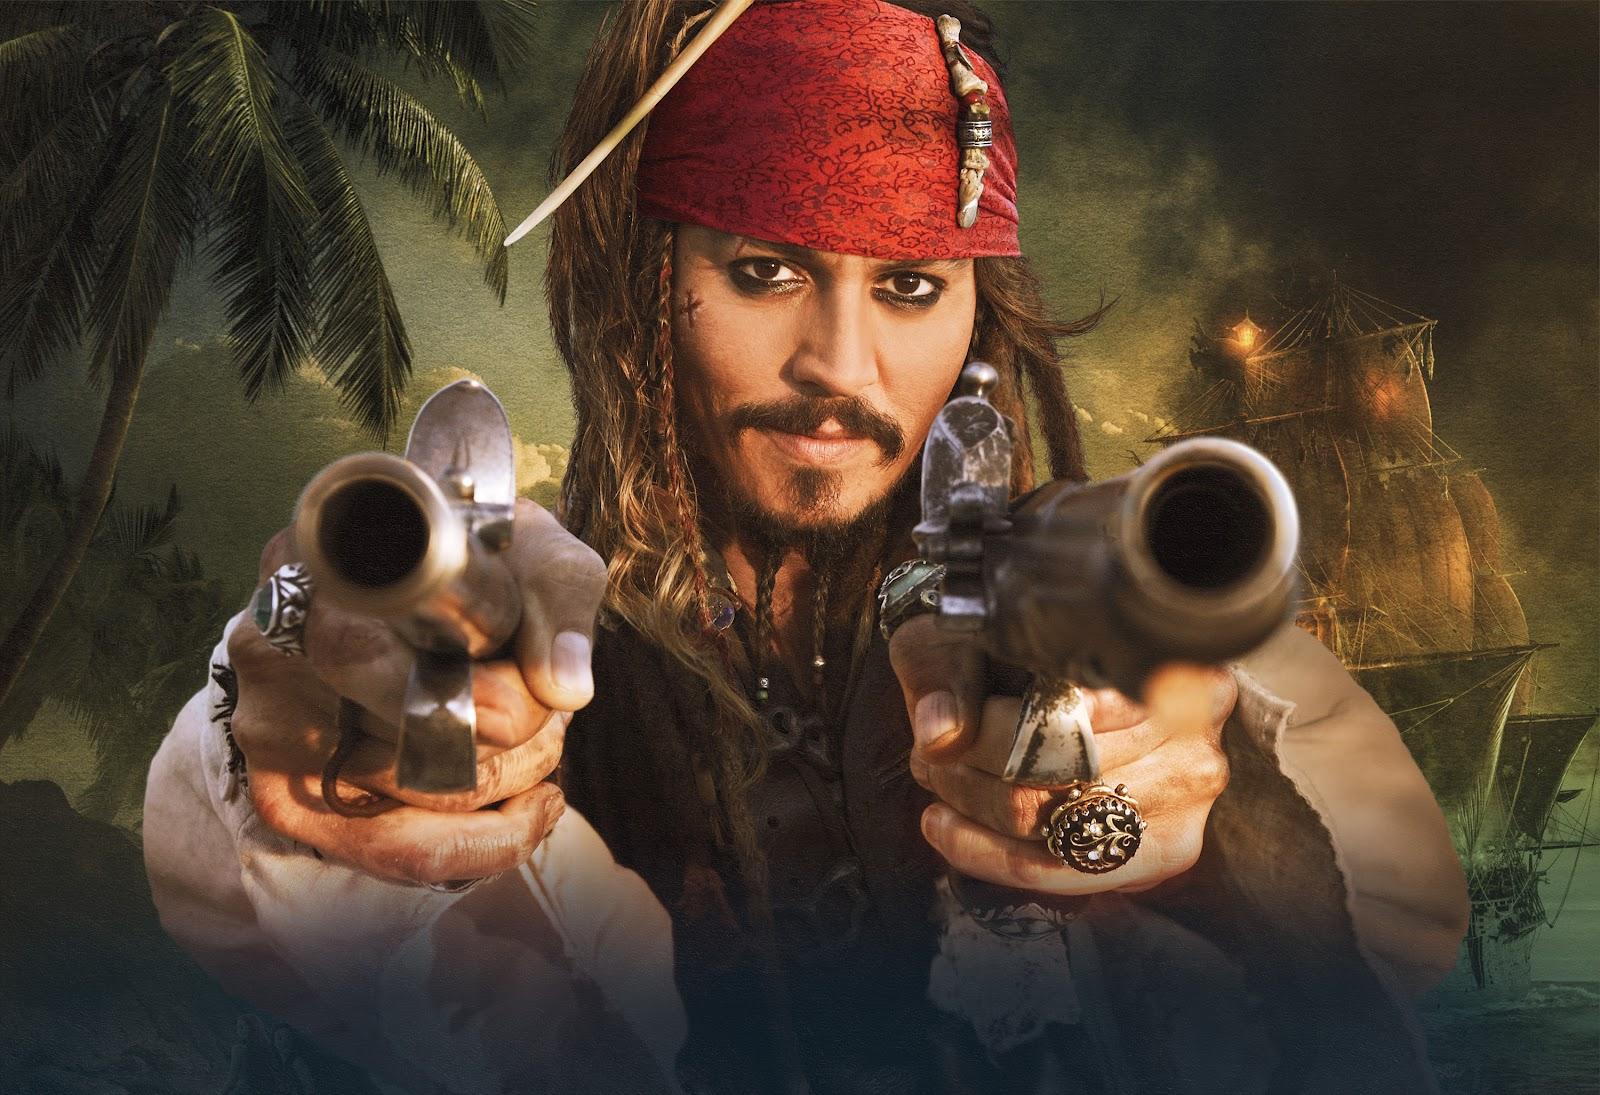 http://3.bp.blogspot.com/-28Su4GiEs4Y/Ty6Vny8TrPI/AAAAAAAABAM/sj6lAepYMm4/s1600/Pirates%2Bof%2BThe%2BCaribbean%2B(26).jpg